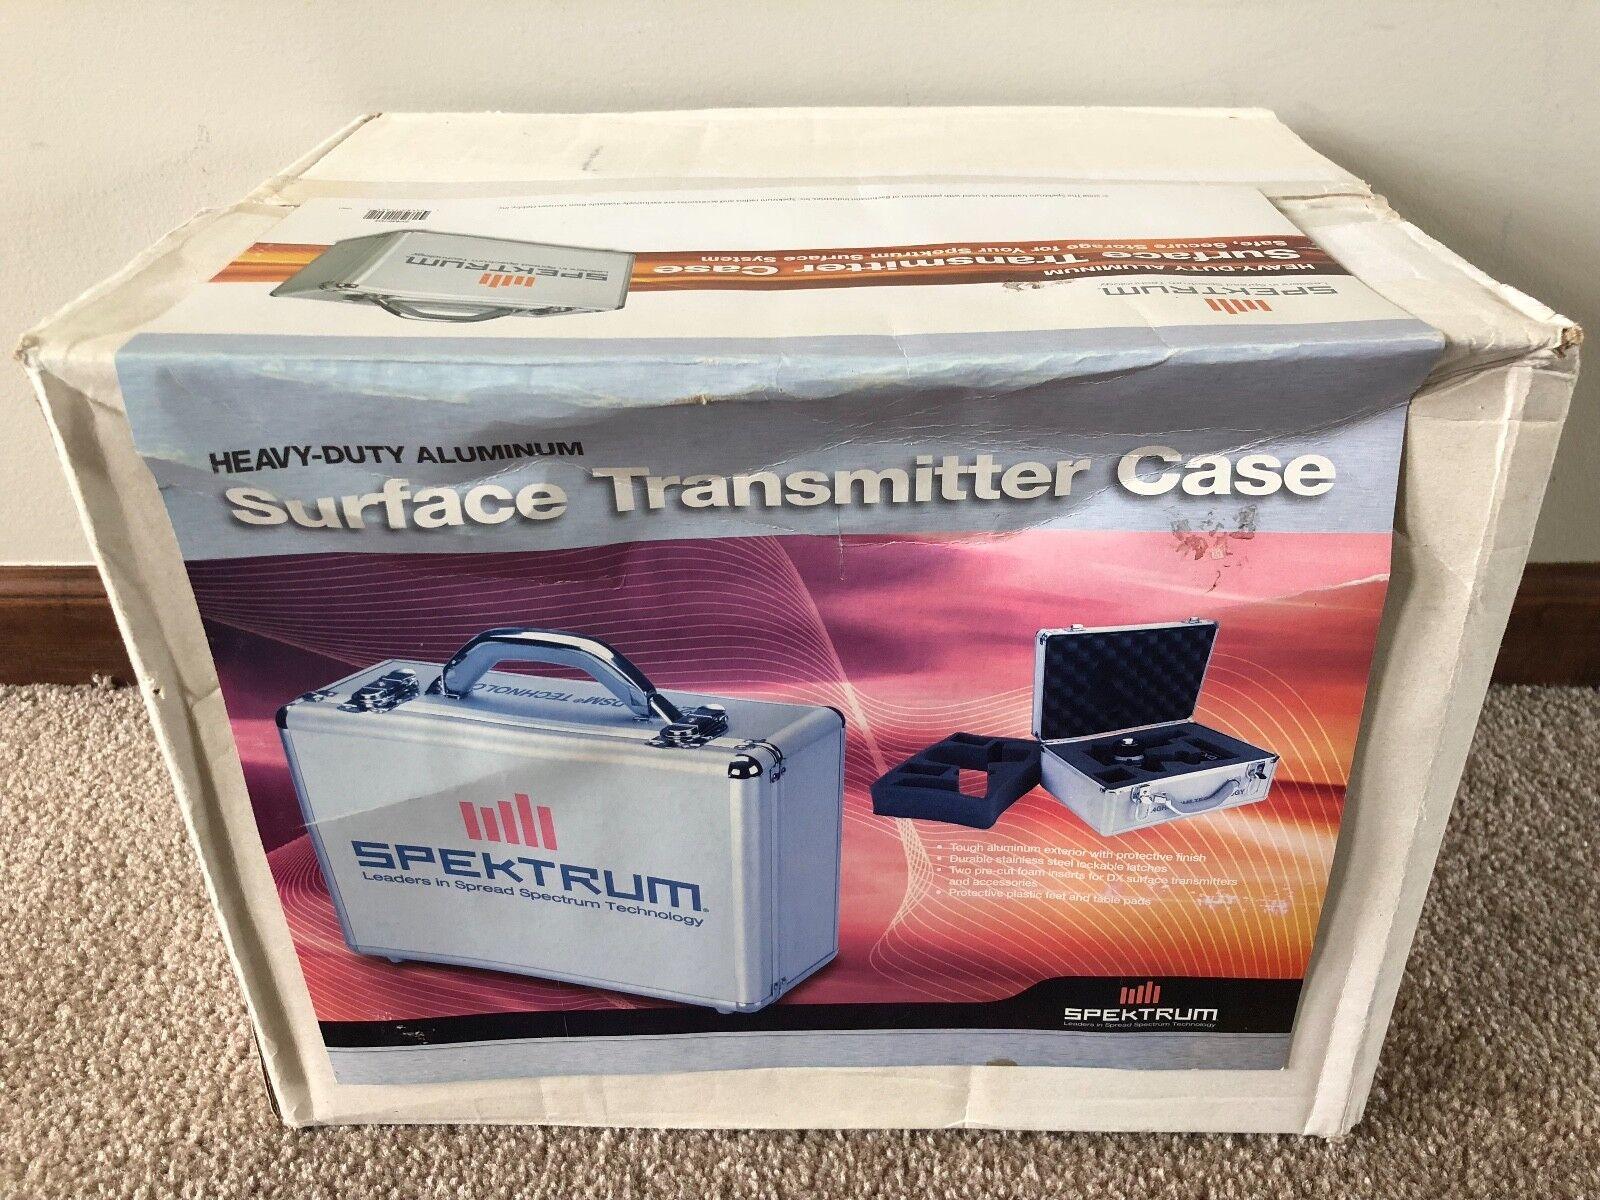 Brand Nuovo Heavy Duty Aluminum Deluxe Spektrum Surface Transmitter Case - SPM6704